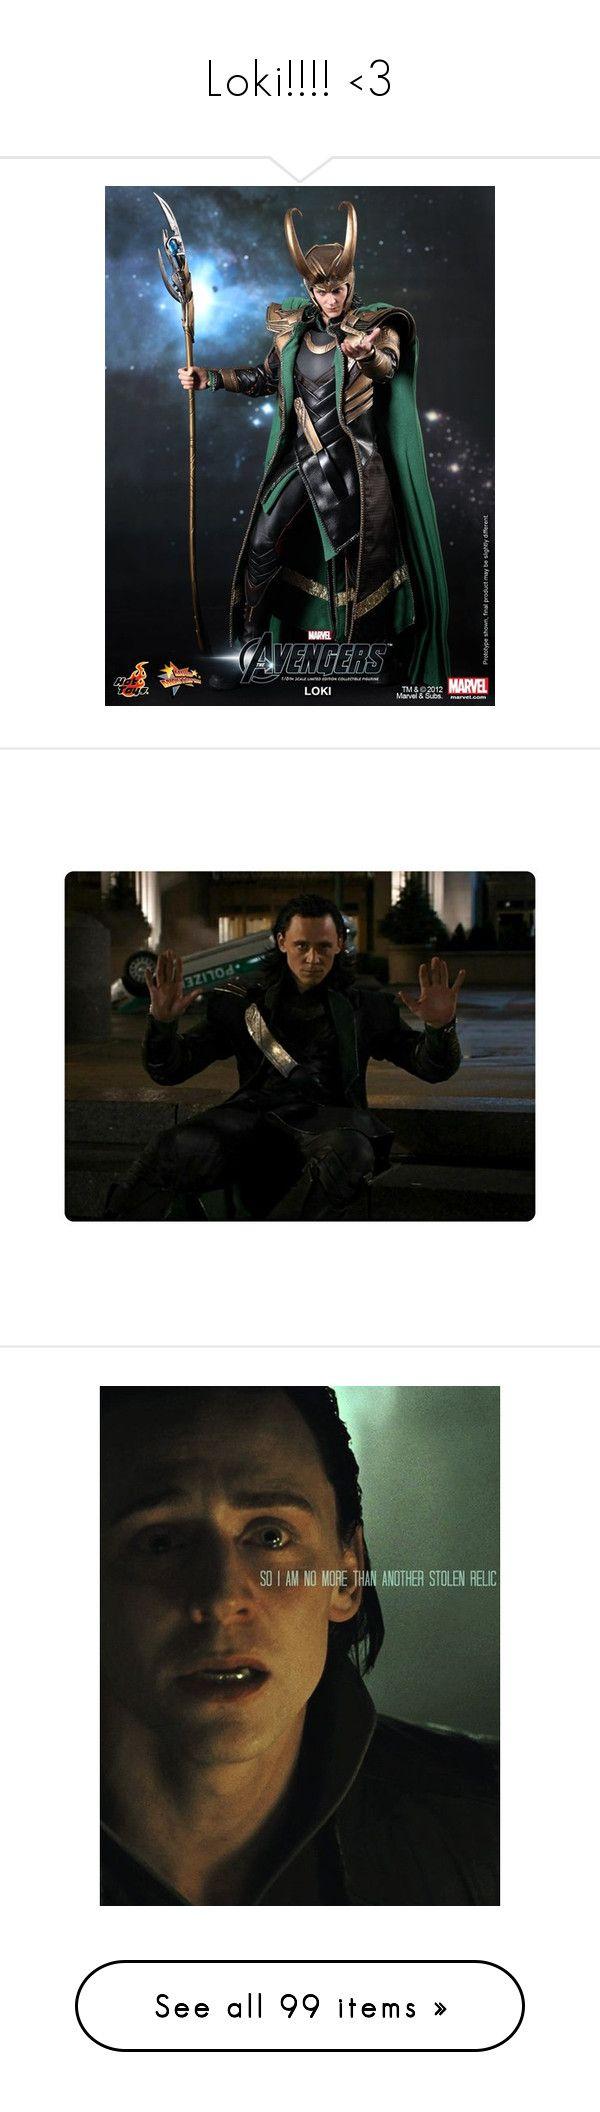 """Loki!!!! <3"" by demondog ❤ liked on Polyvore featuring loki, avengers, images, pictures, tom hiddleston, marvel, loki & thor, thor, the avengers and people"